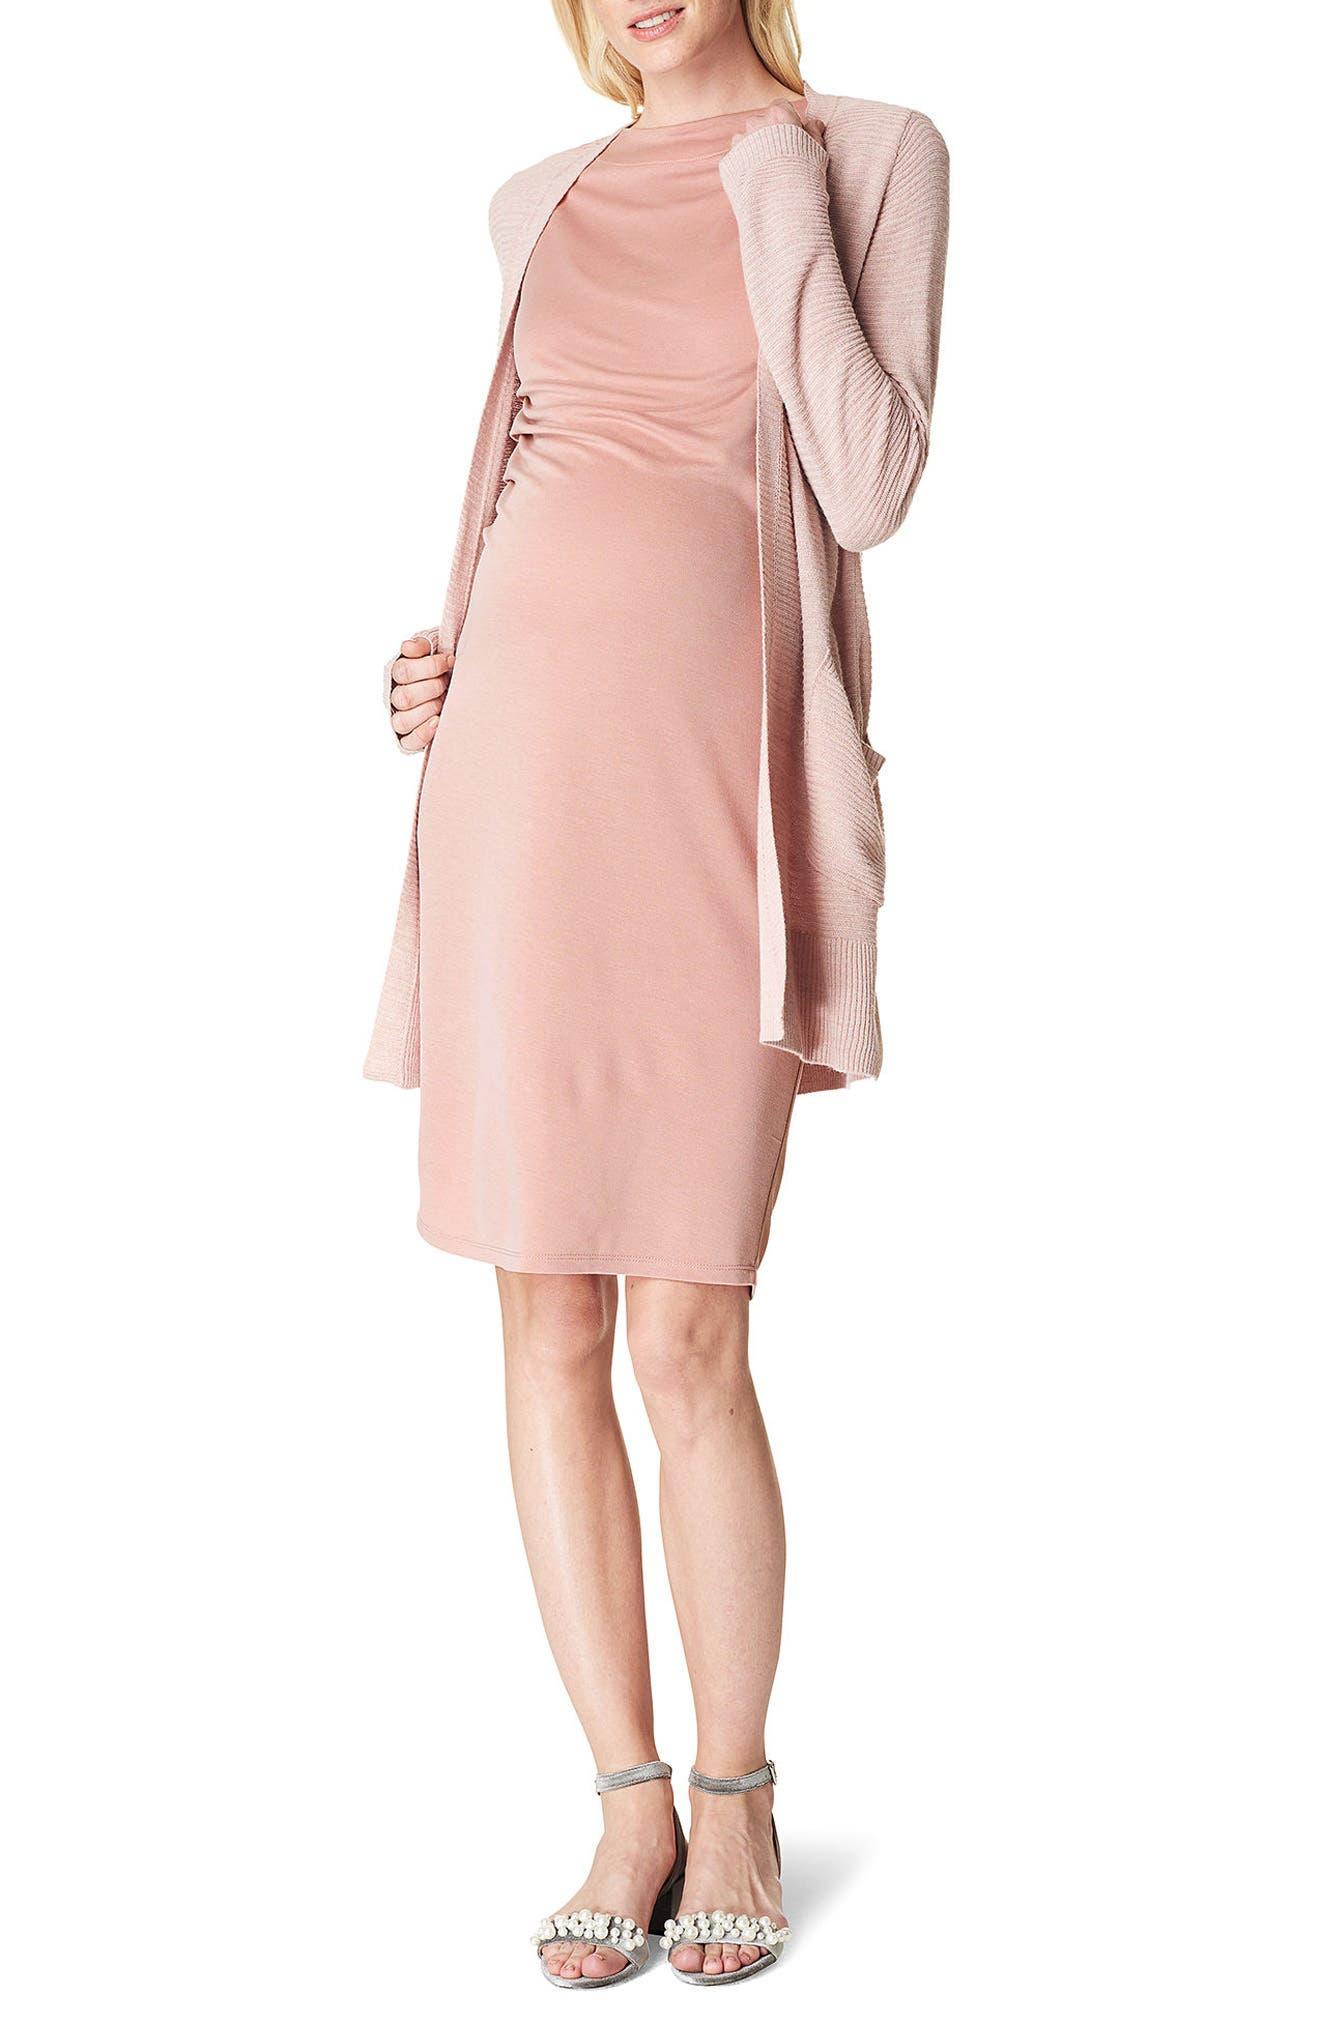 Annefleur Maternity Sheath Dress,                             Main thumbnail 1, color,                             Blush